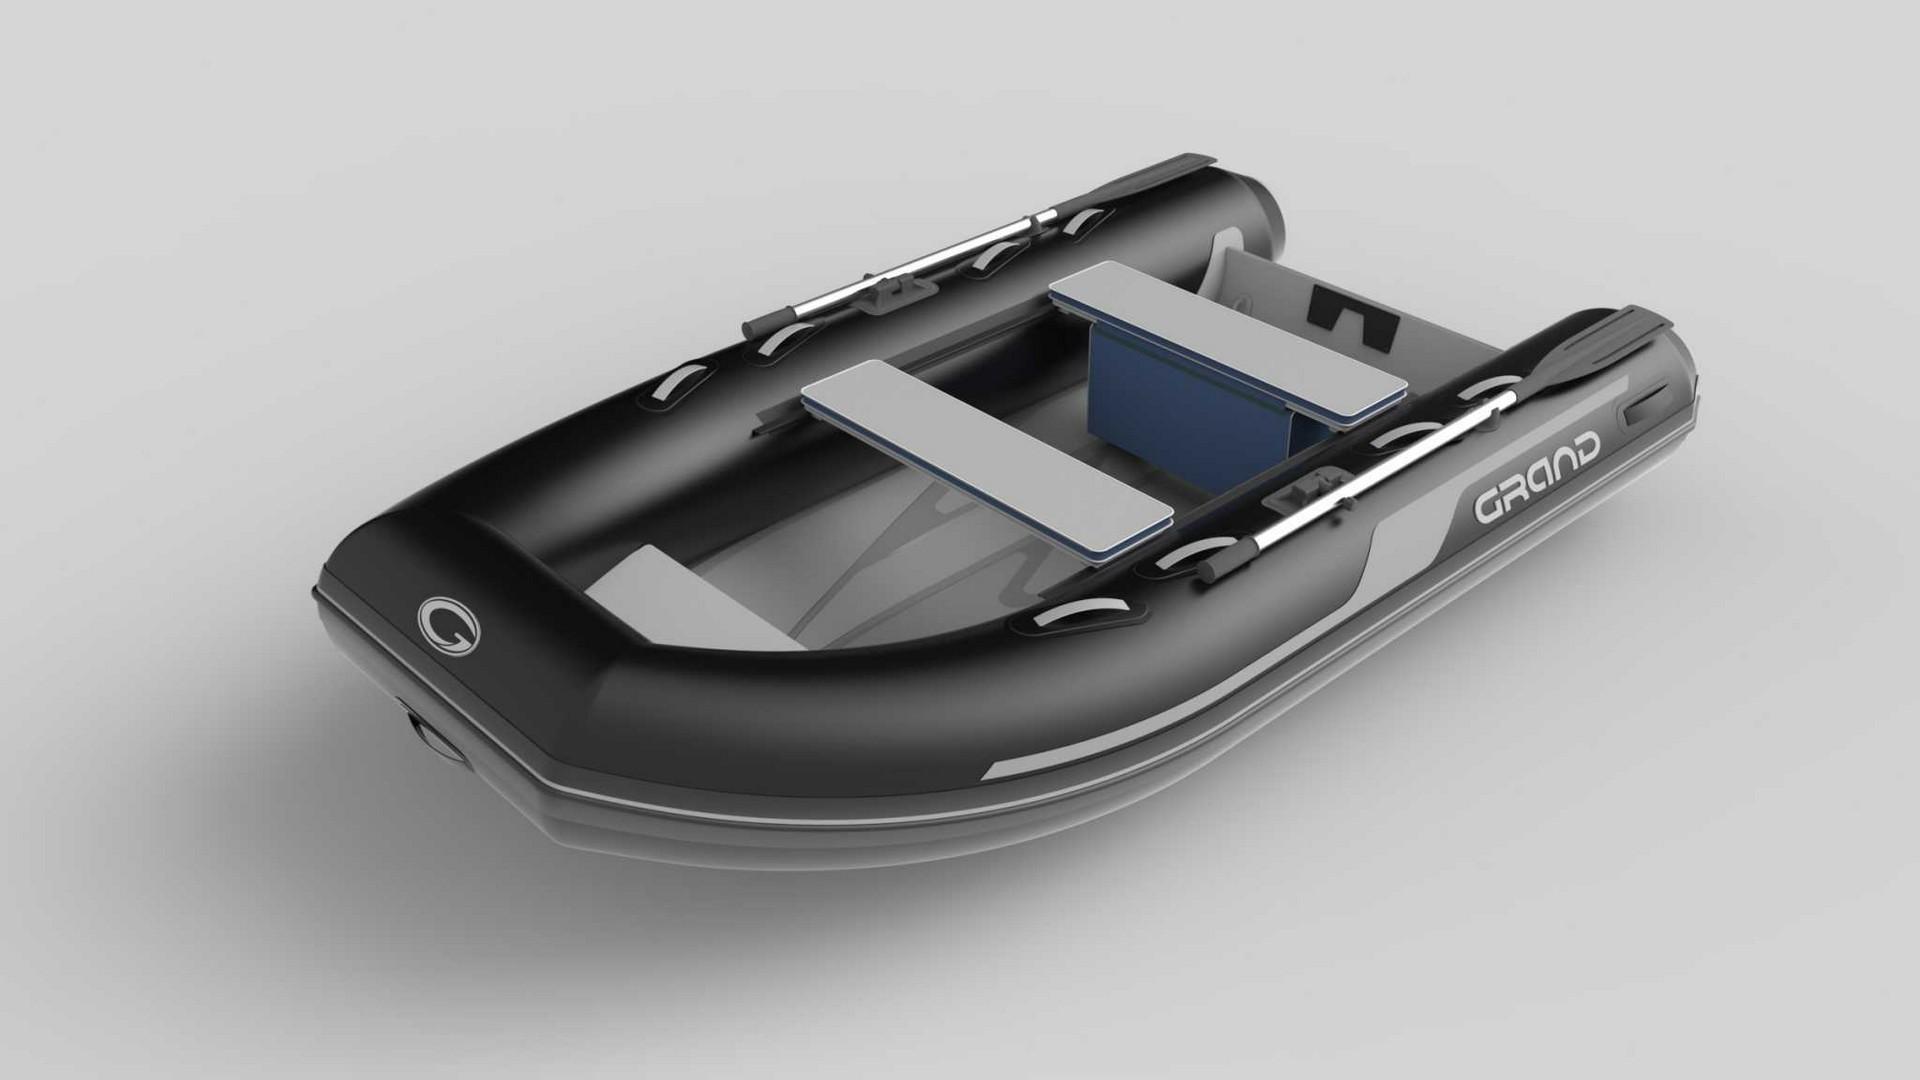 Надувная лодка с жестким алюминиевым дном GRAND Aluminum Line Alu270D,  Надувная лодка GRAND Aluminum Line Alu270D, GRAND Aluminum Line Alu270D, GRAND Alu270D, Надувная лодка GRAND, Надувная лодка ГРАНД, Надувная лодка с жестким дном, RIB, Rigid Inflatable Boats